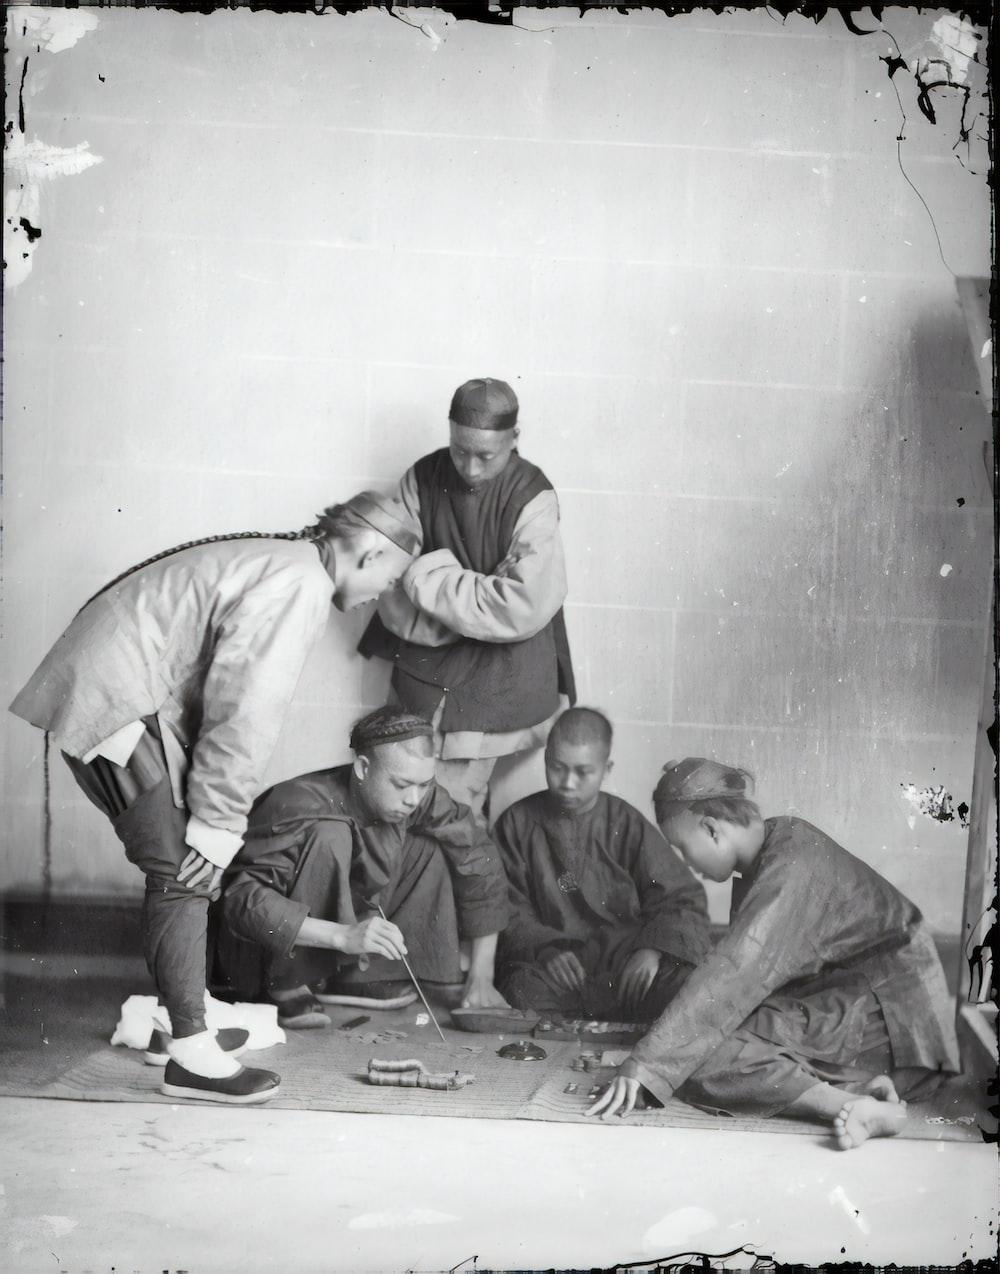 3 men sitting on floor